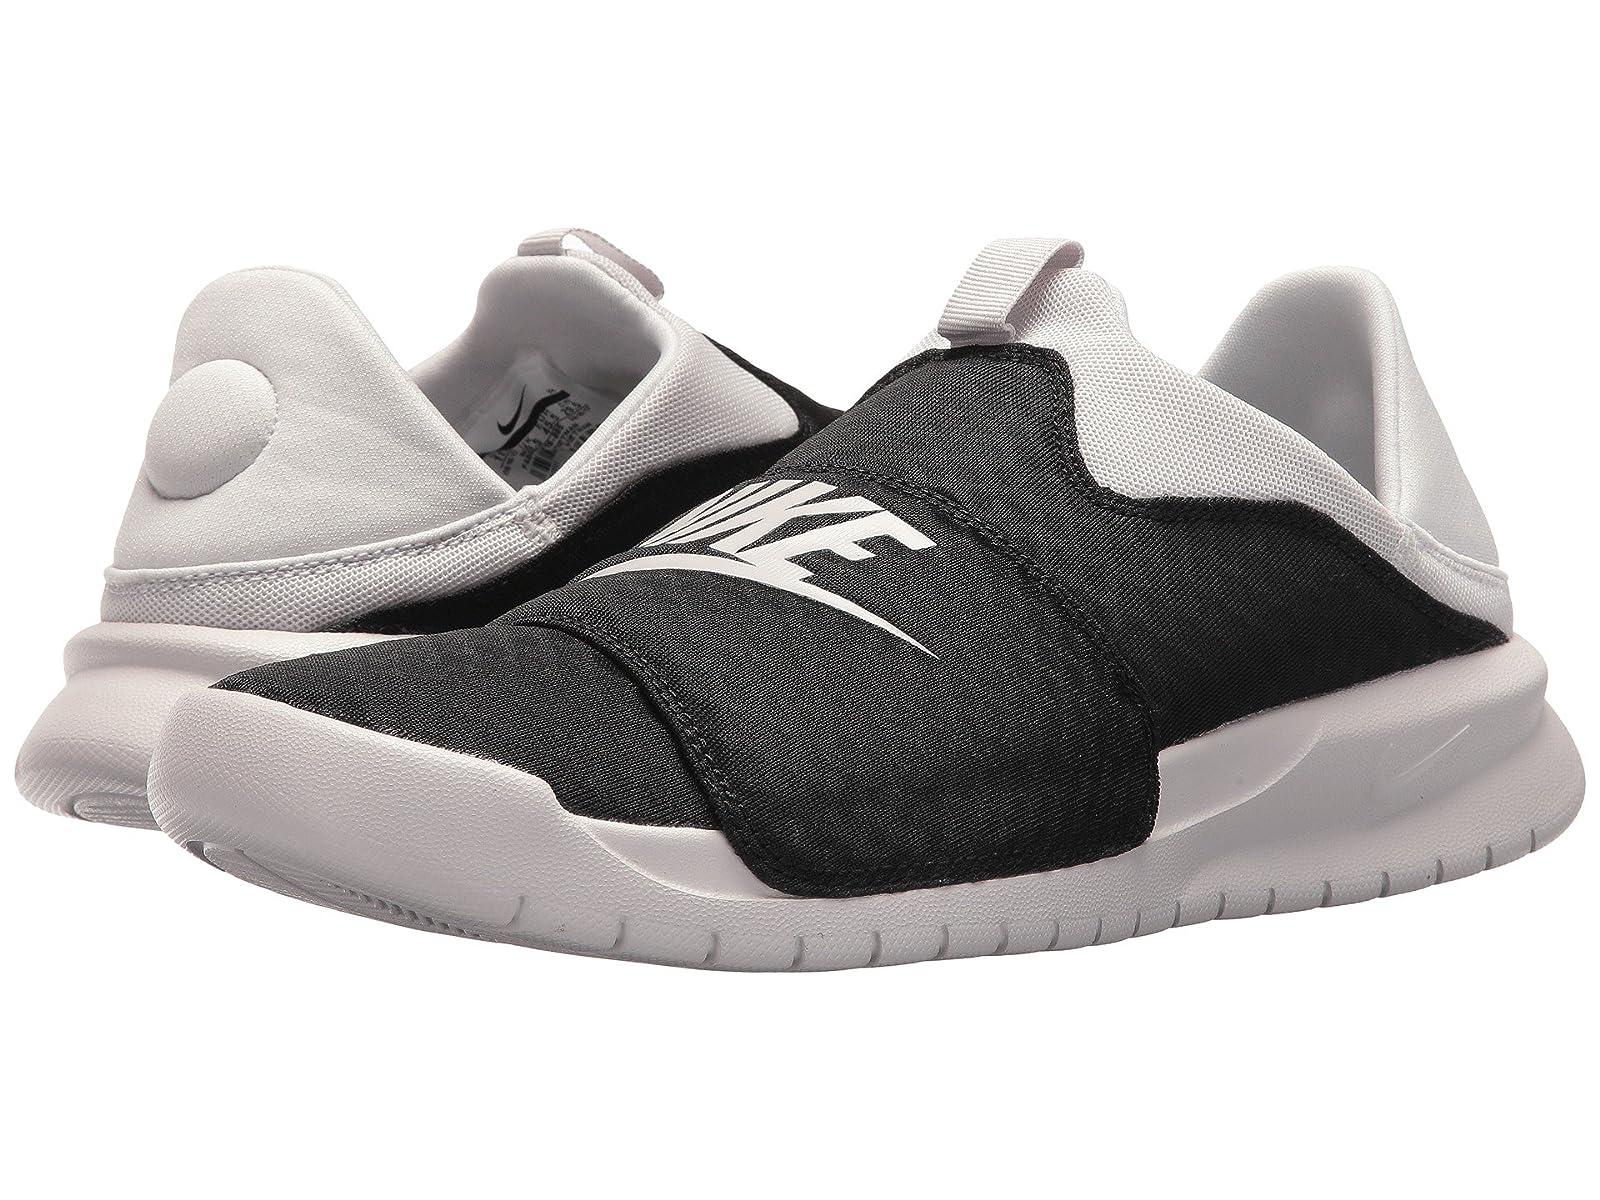 Nike Benassi Slip-OnCheap and distinctive eye-catching shoes